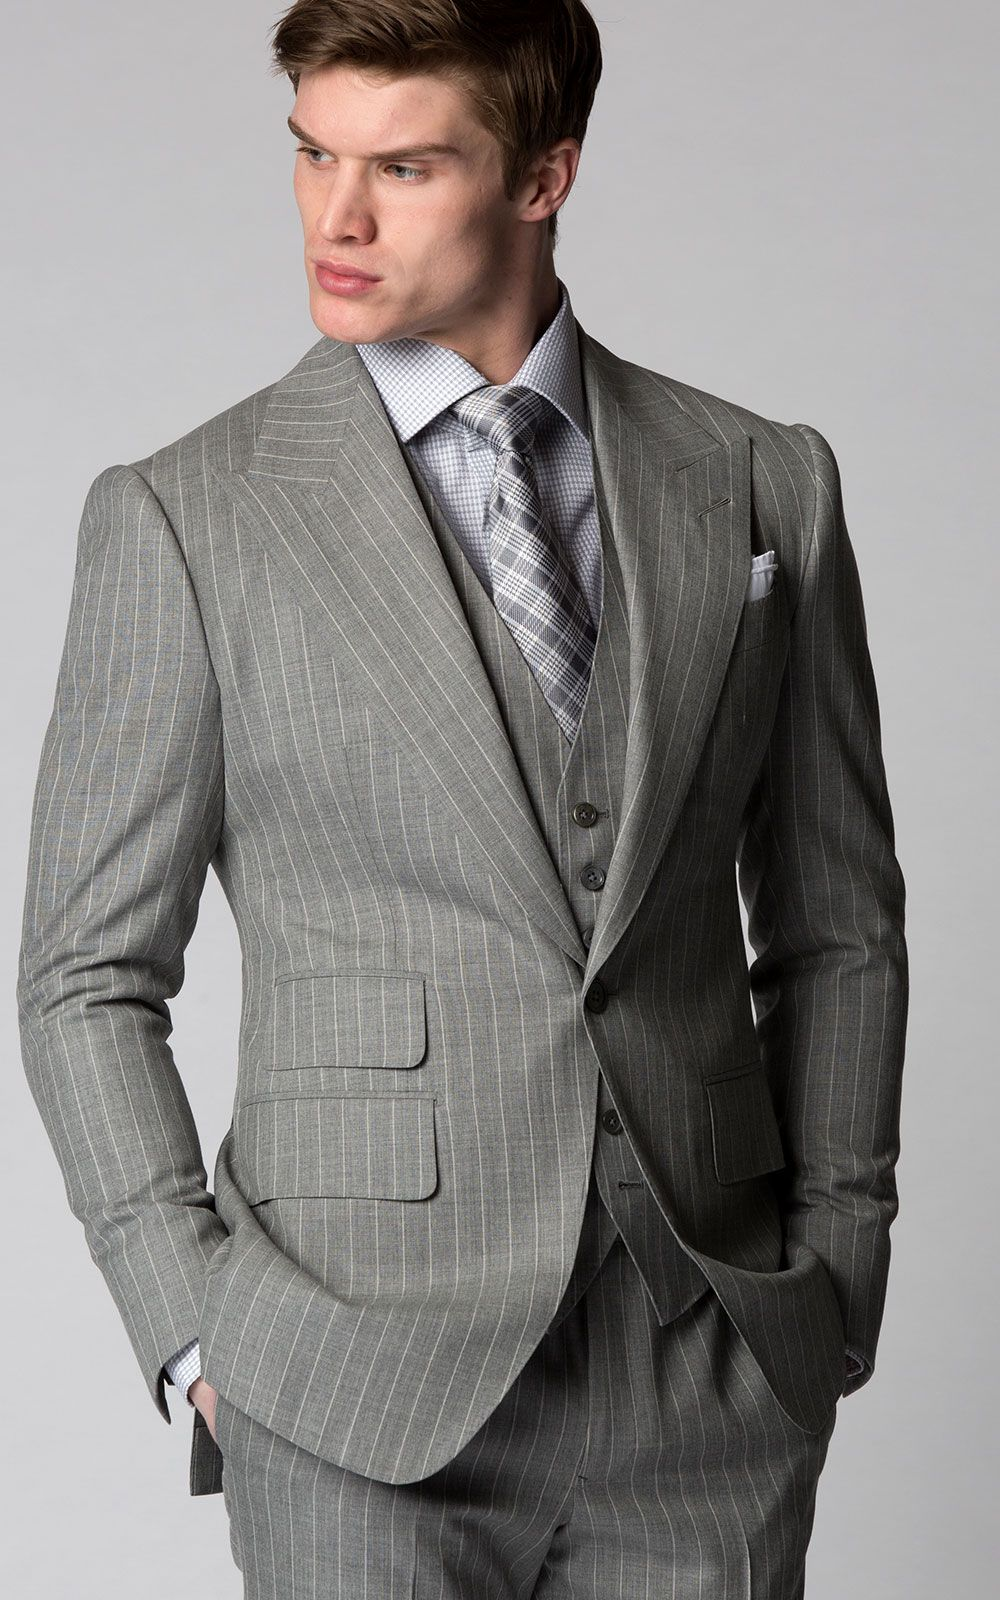 Custom Bespoke Light Grey Pinstripe 3-Piece Summer Suit with Peak ...